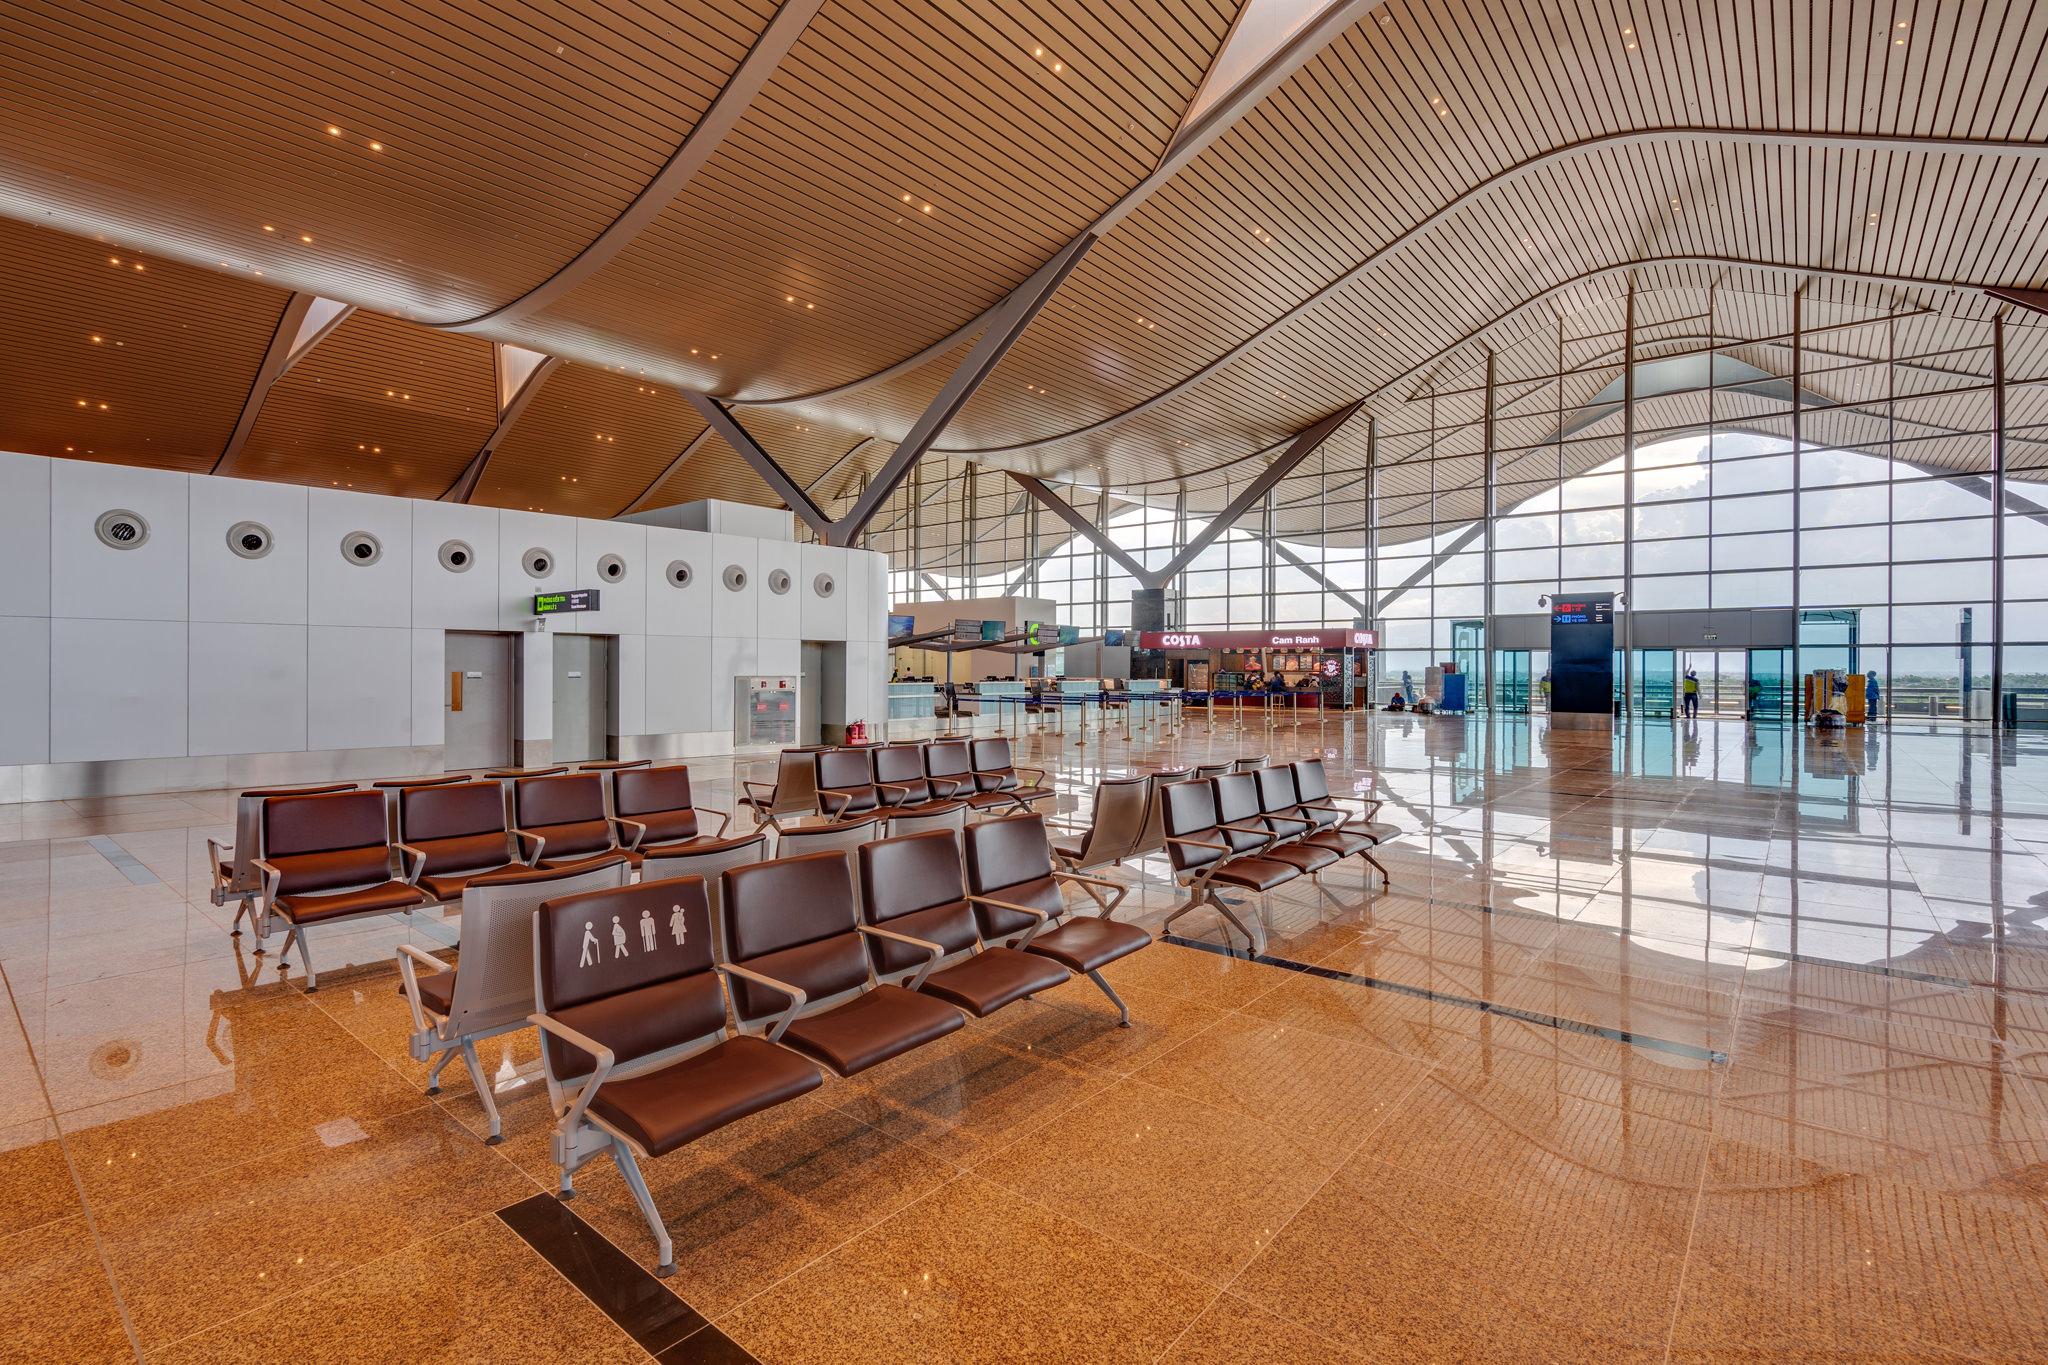 20180626 - Cam Ranh Airport - Architecture - 0326.jpg